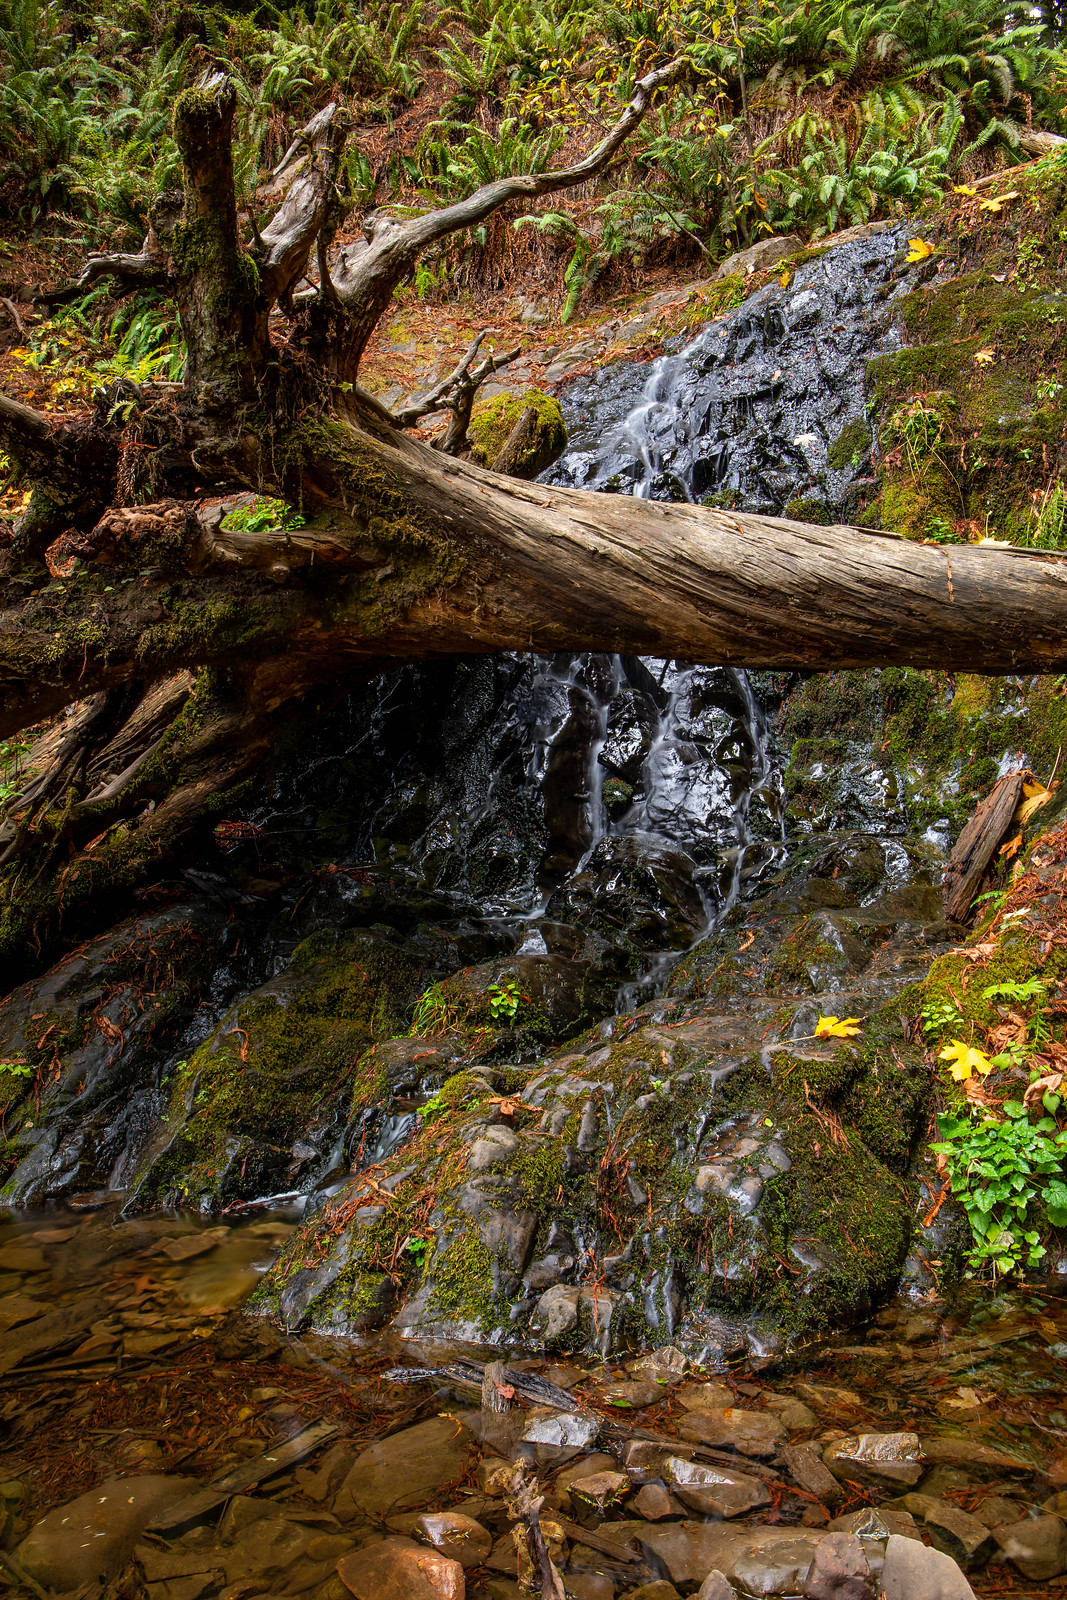 11.03. Jedediah Smith Redwoods State Park